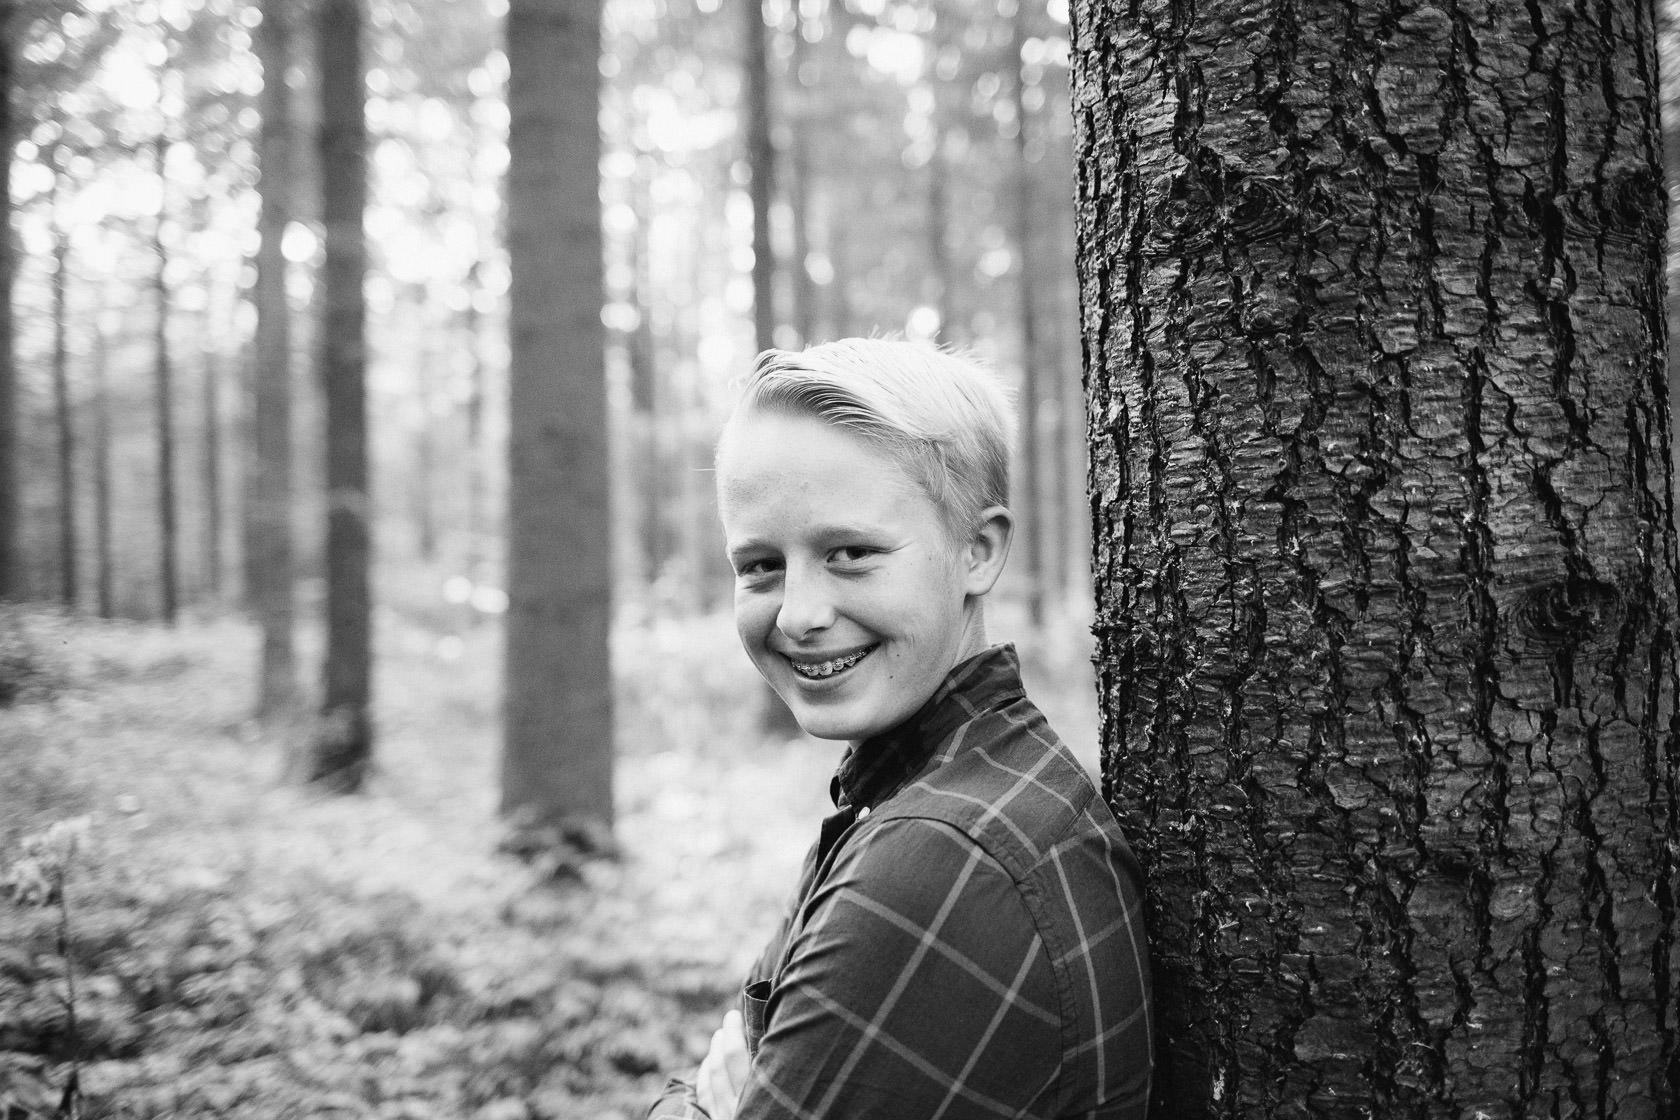 Familienfotos im Herbst in Waghäusel Familie Anders SW Schwarzweiss Blackandwhite Wald Herbstlaub